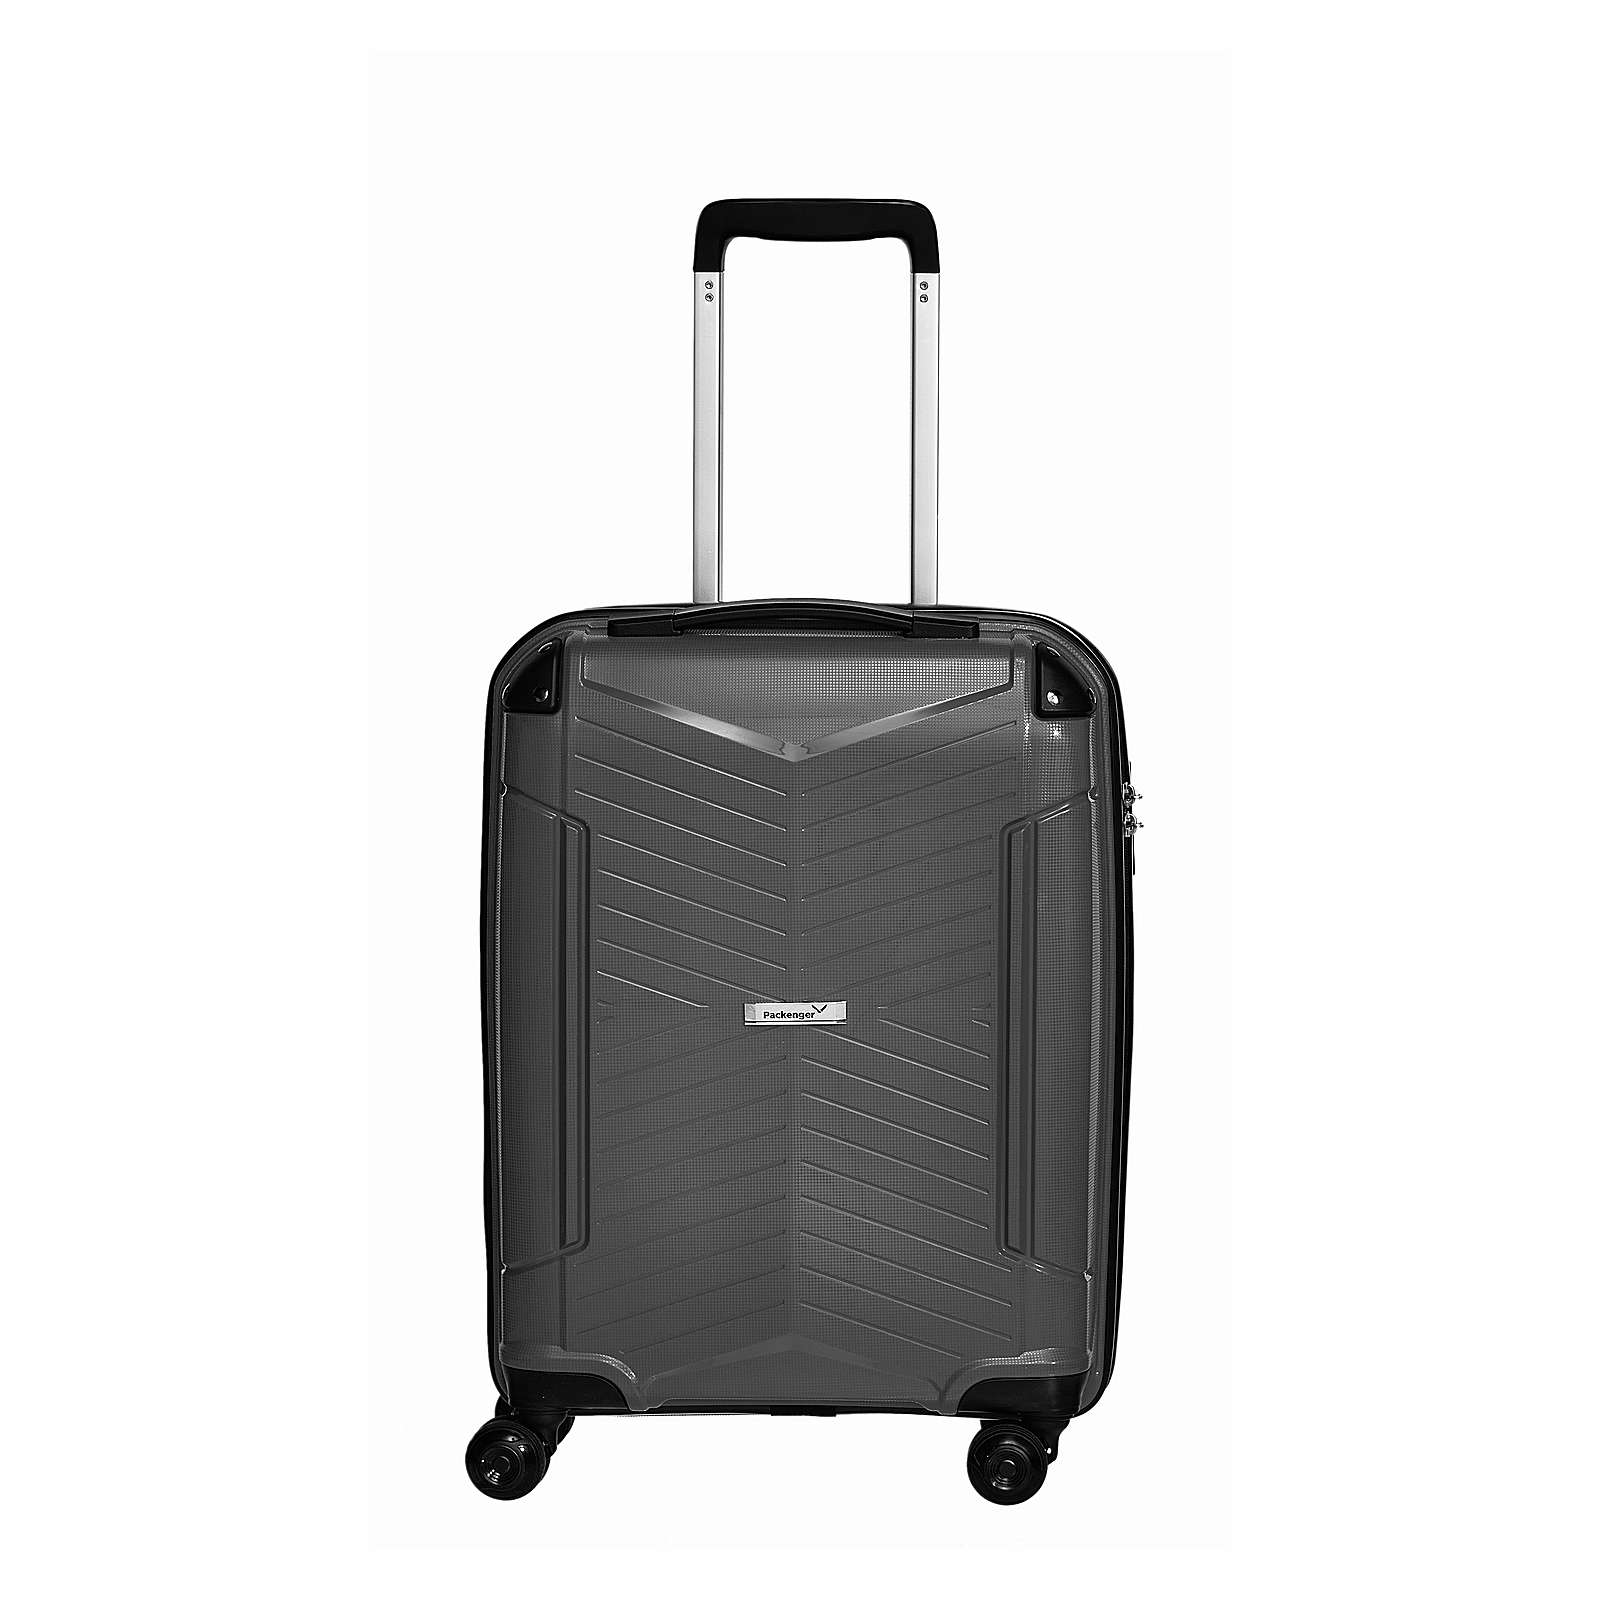 Packenger Koffer Premium Bordcase Silent schwarz